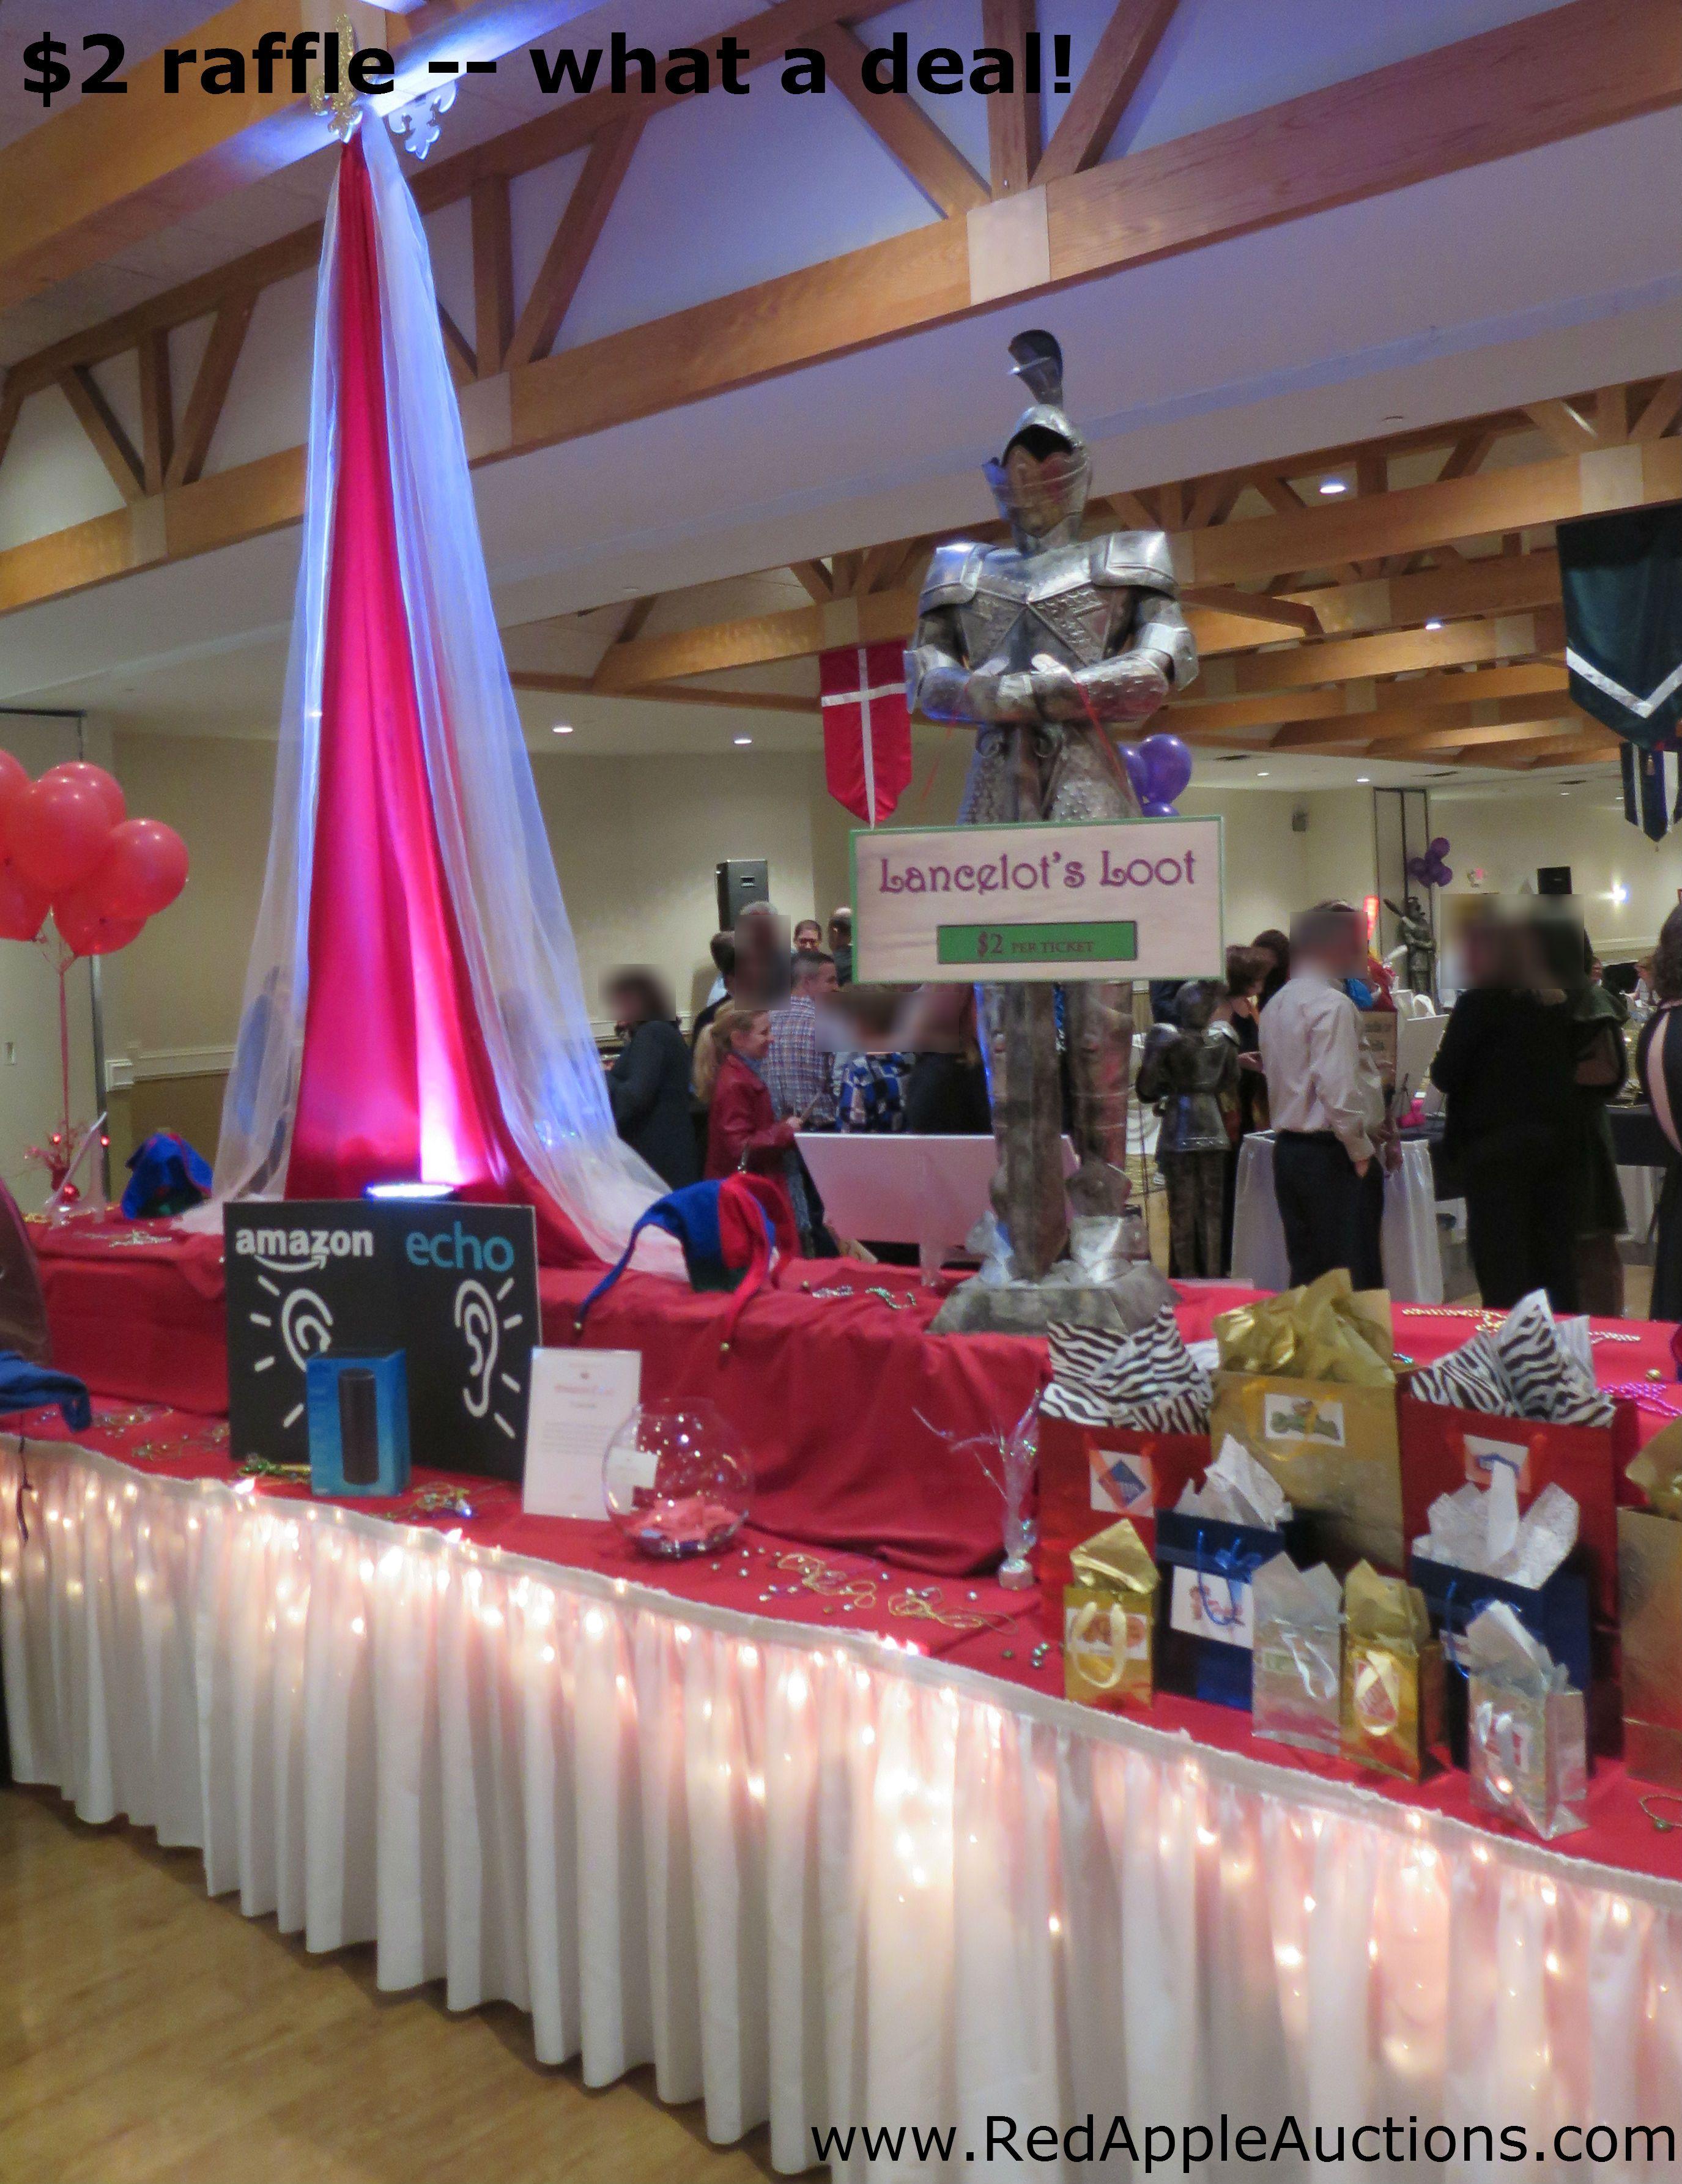 fundraising lights made it pop raffle table